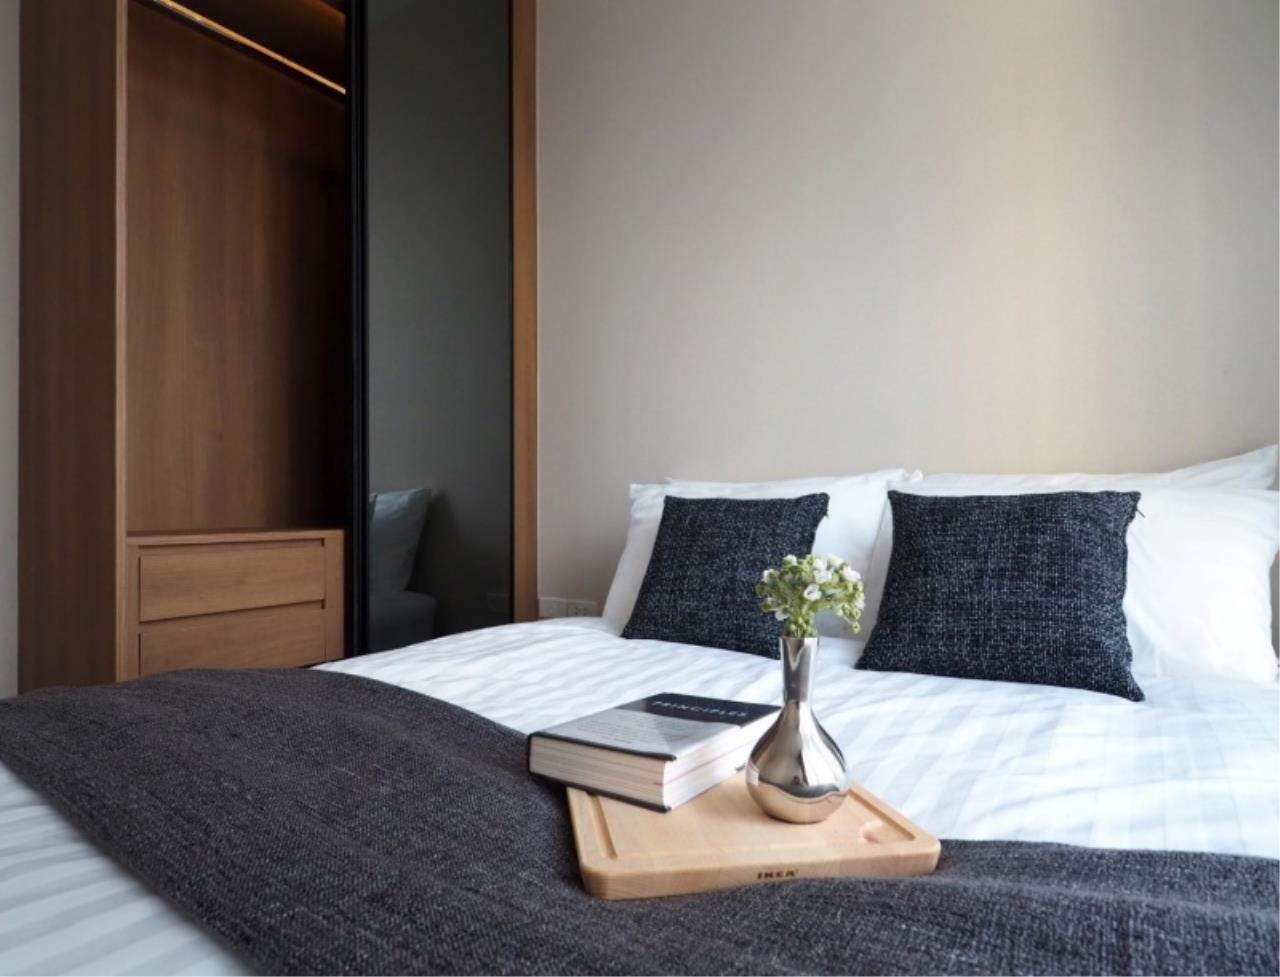 Century21 Skylux Agency's Park 24 / Condo For Rent / 2 Bedroom / 53.53 SQM / BTS Phrom Phong / Bangkok 11